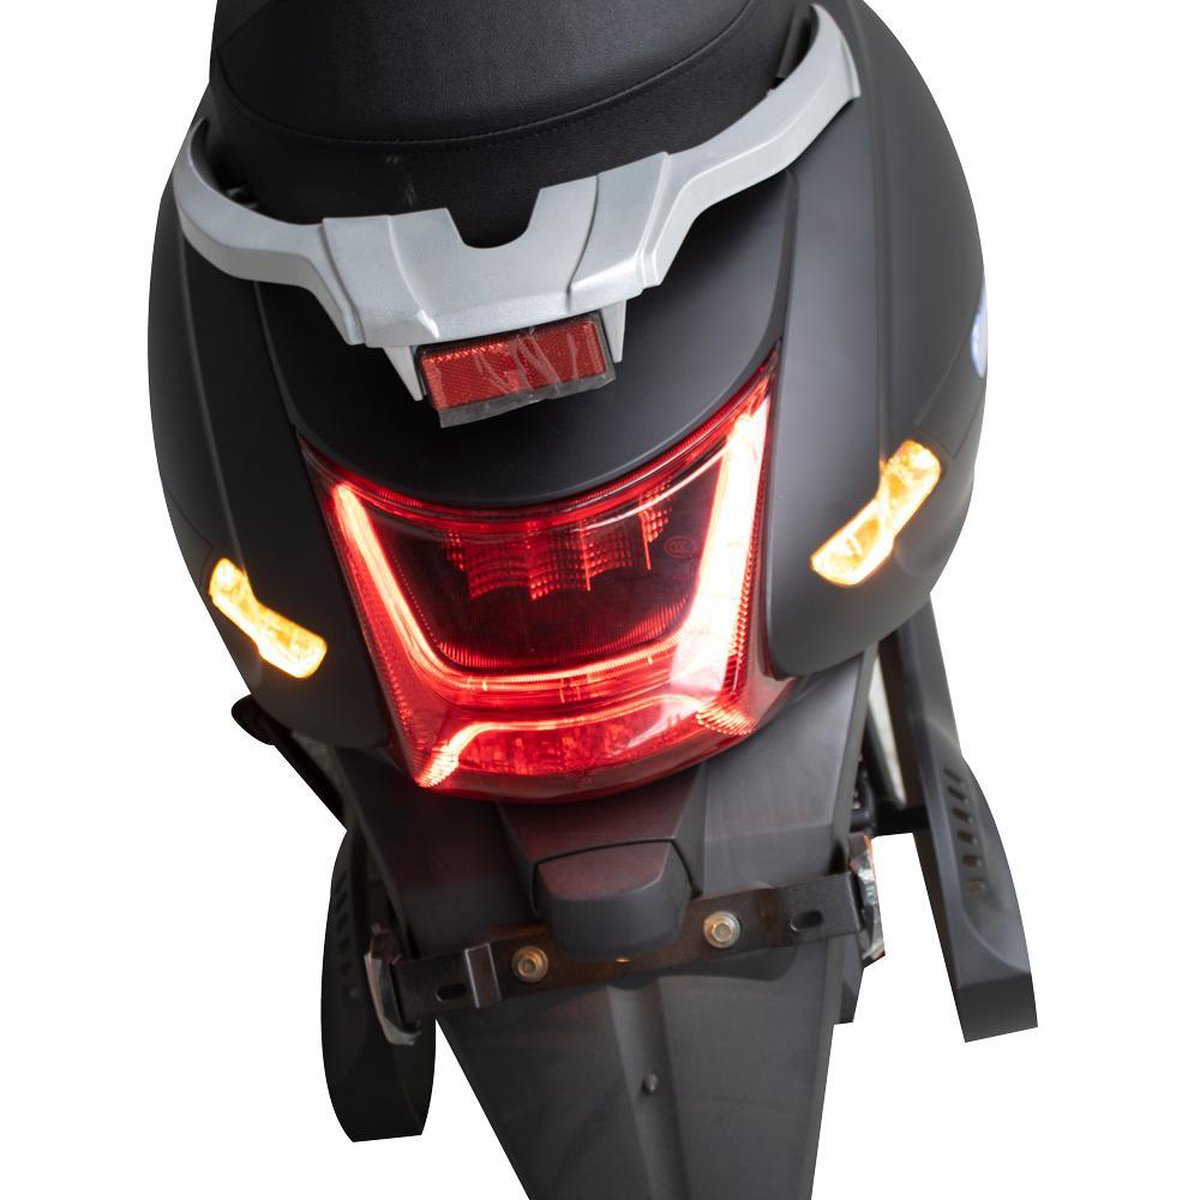 Elephant - City- Elektrische scooter - 25km/h - Actieradius 45km - Blauw